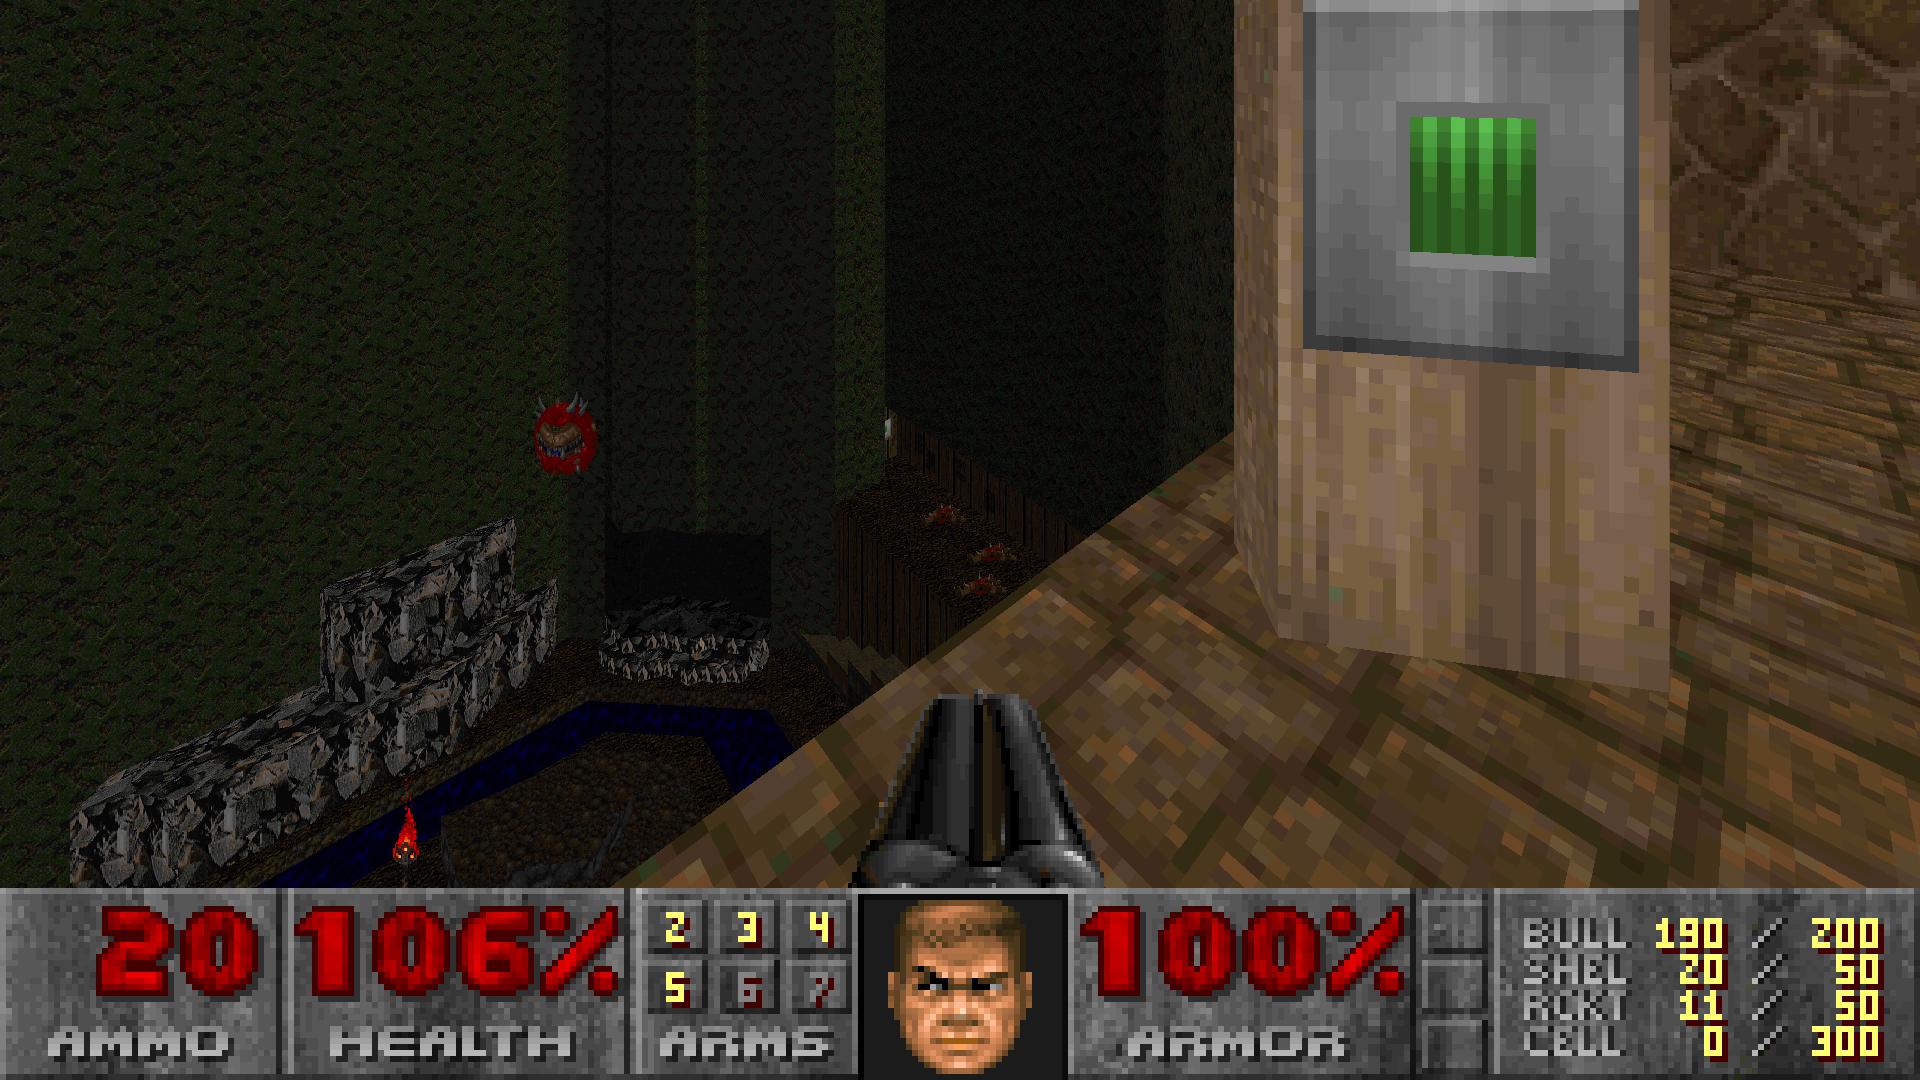 Screenshot_Doom_20190709_212539.png.5e48090ffac706421ade3890cca1c3c5.png